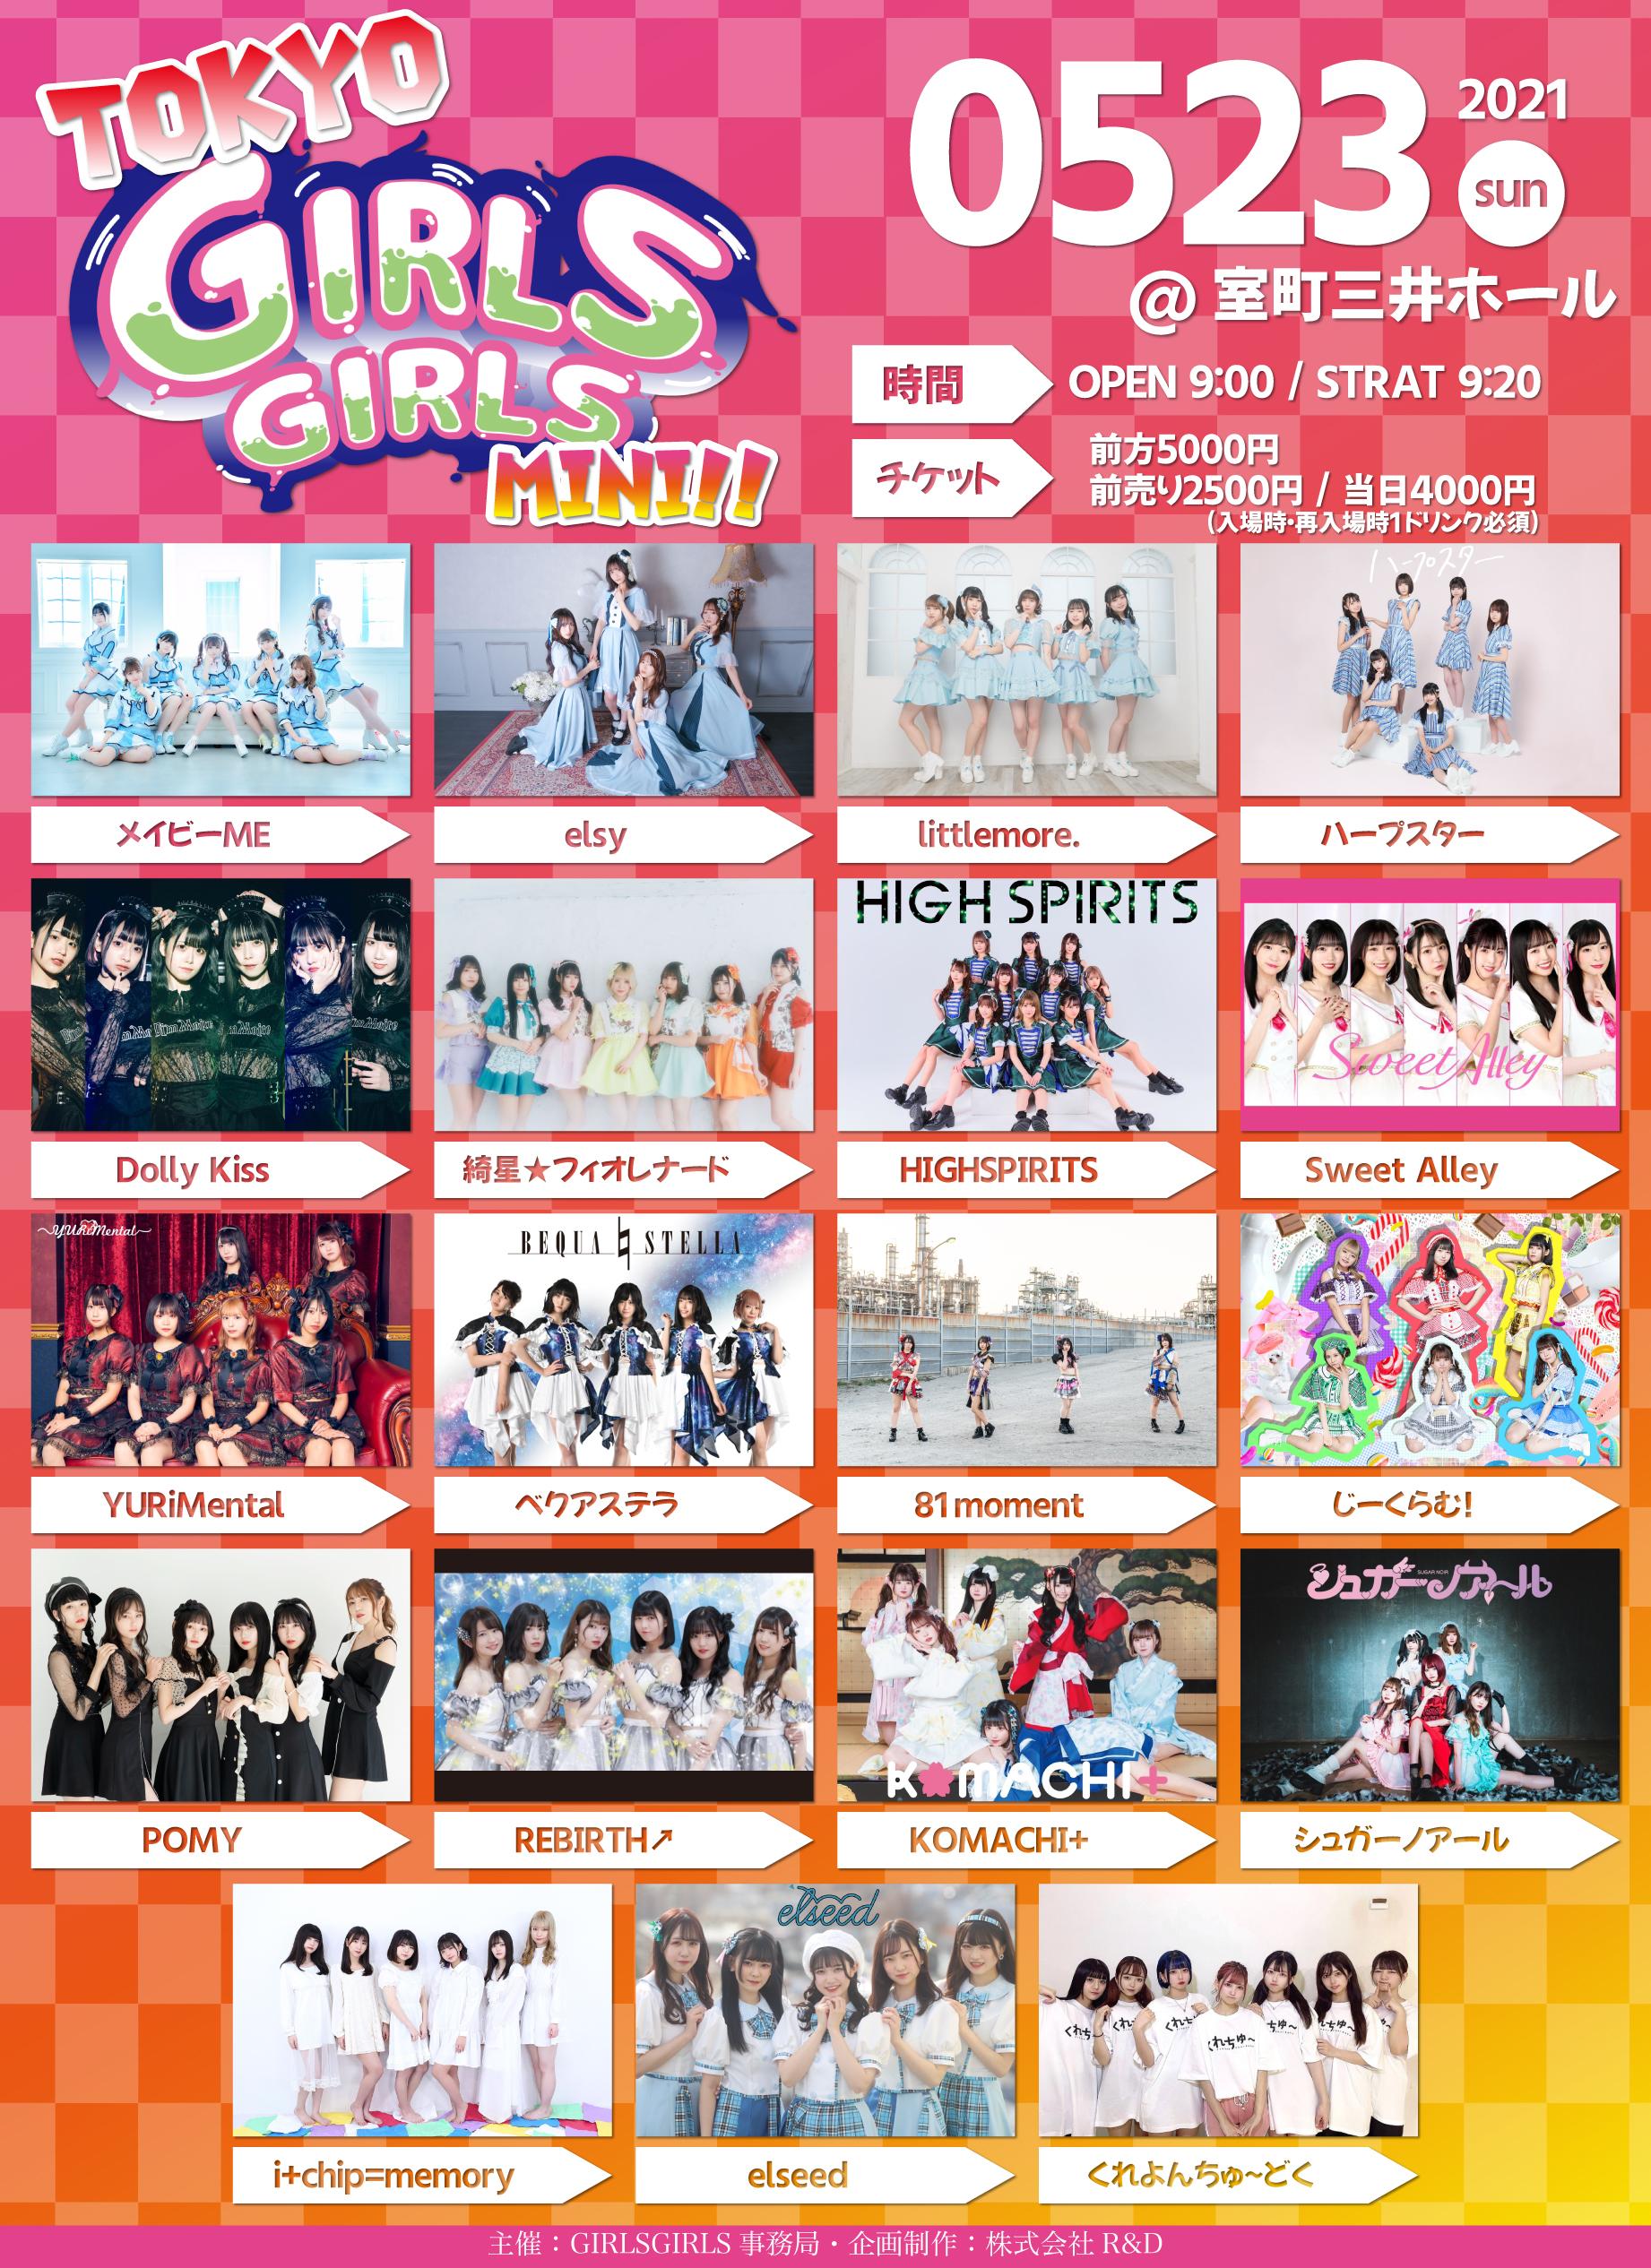 5/23(日) TOKYO GIRLS GIRLS mini!!